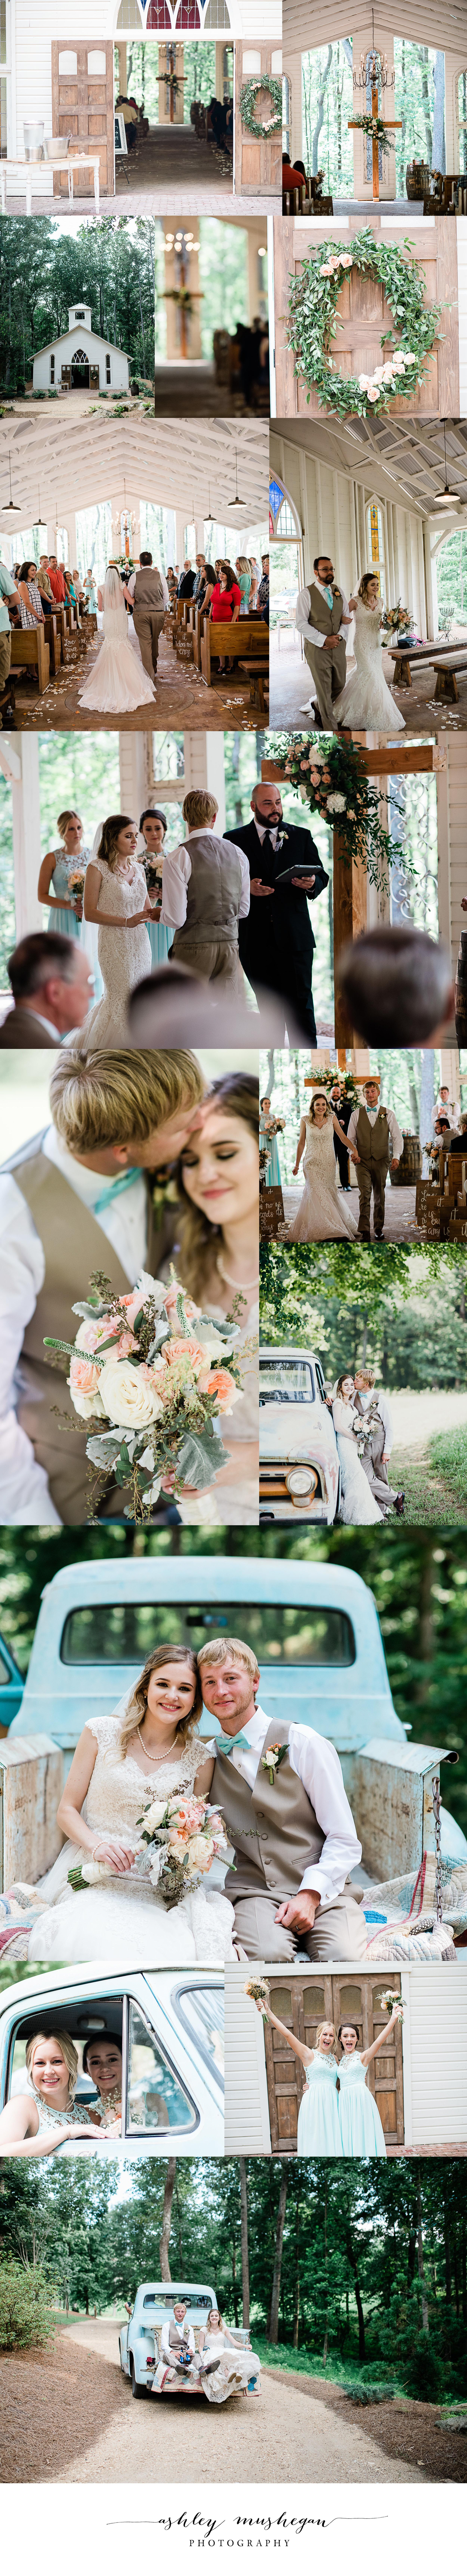 perkins wedding blog 6.jpg